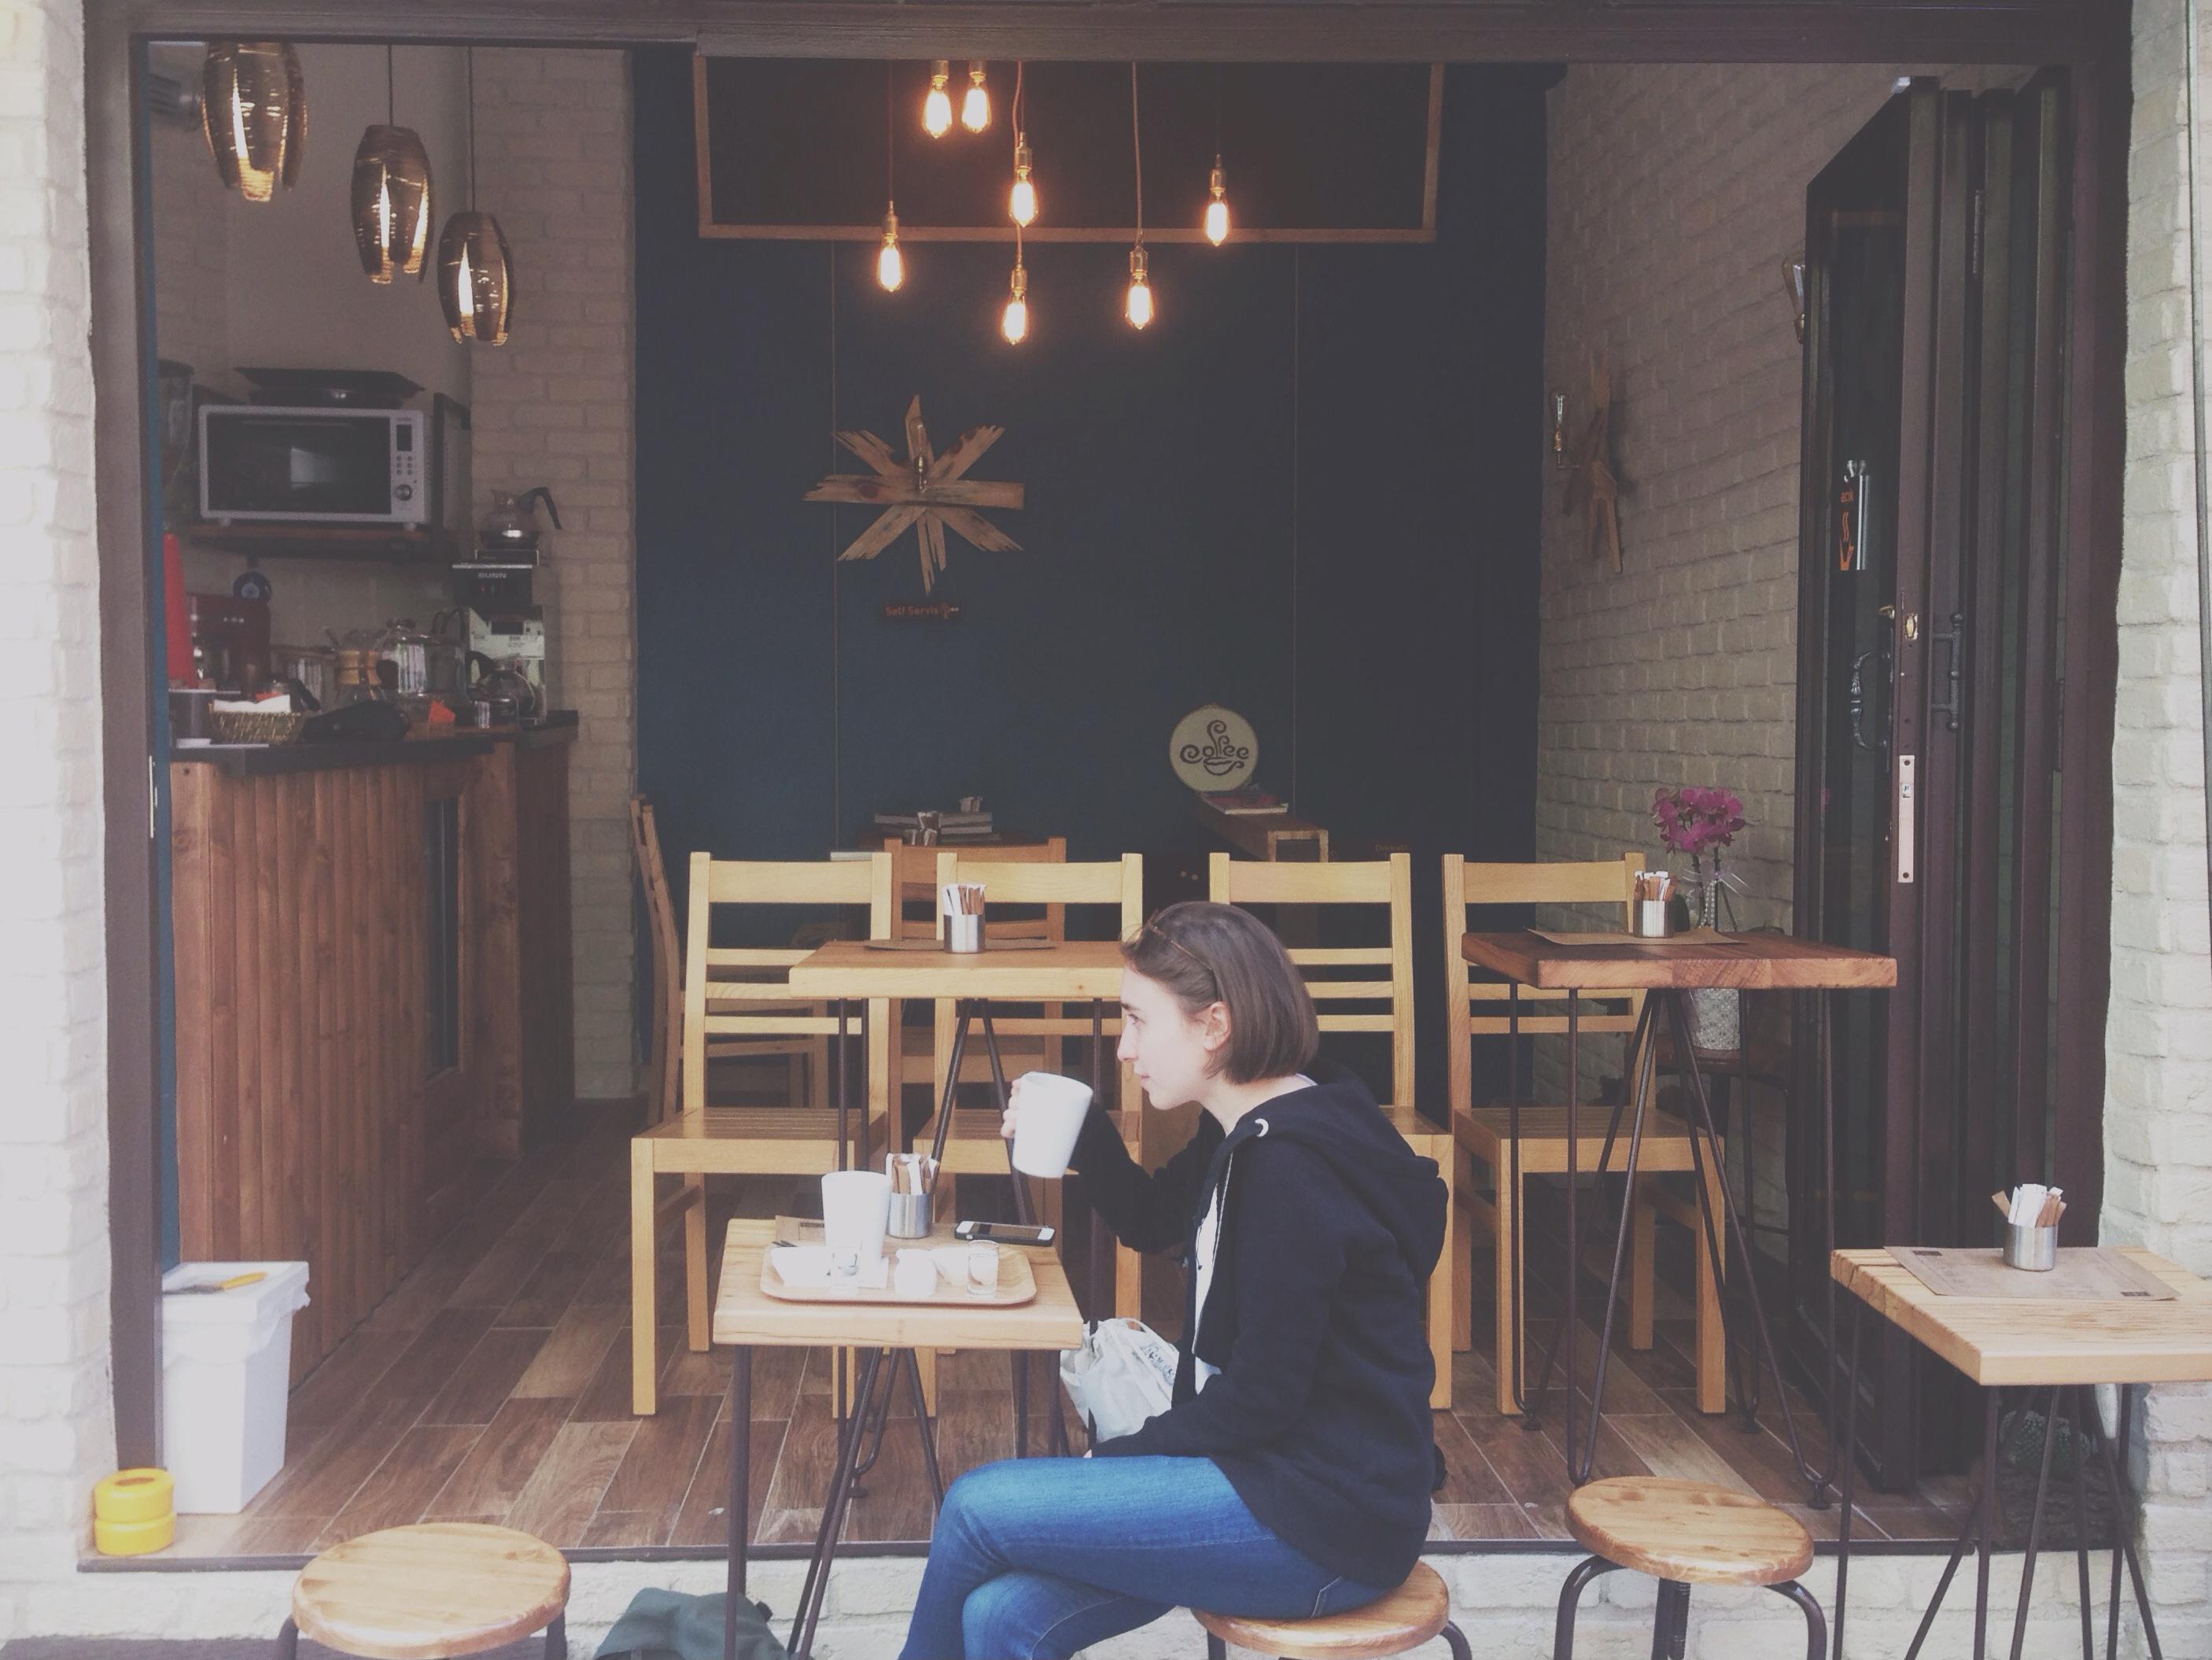 themagger - kadıköy tribu caffe artigiano